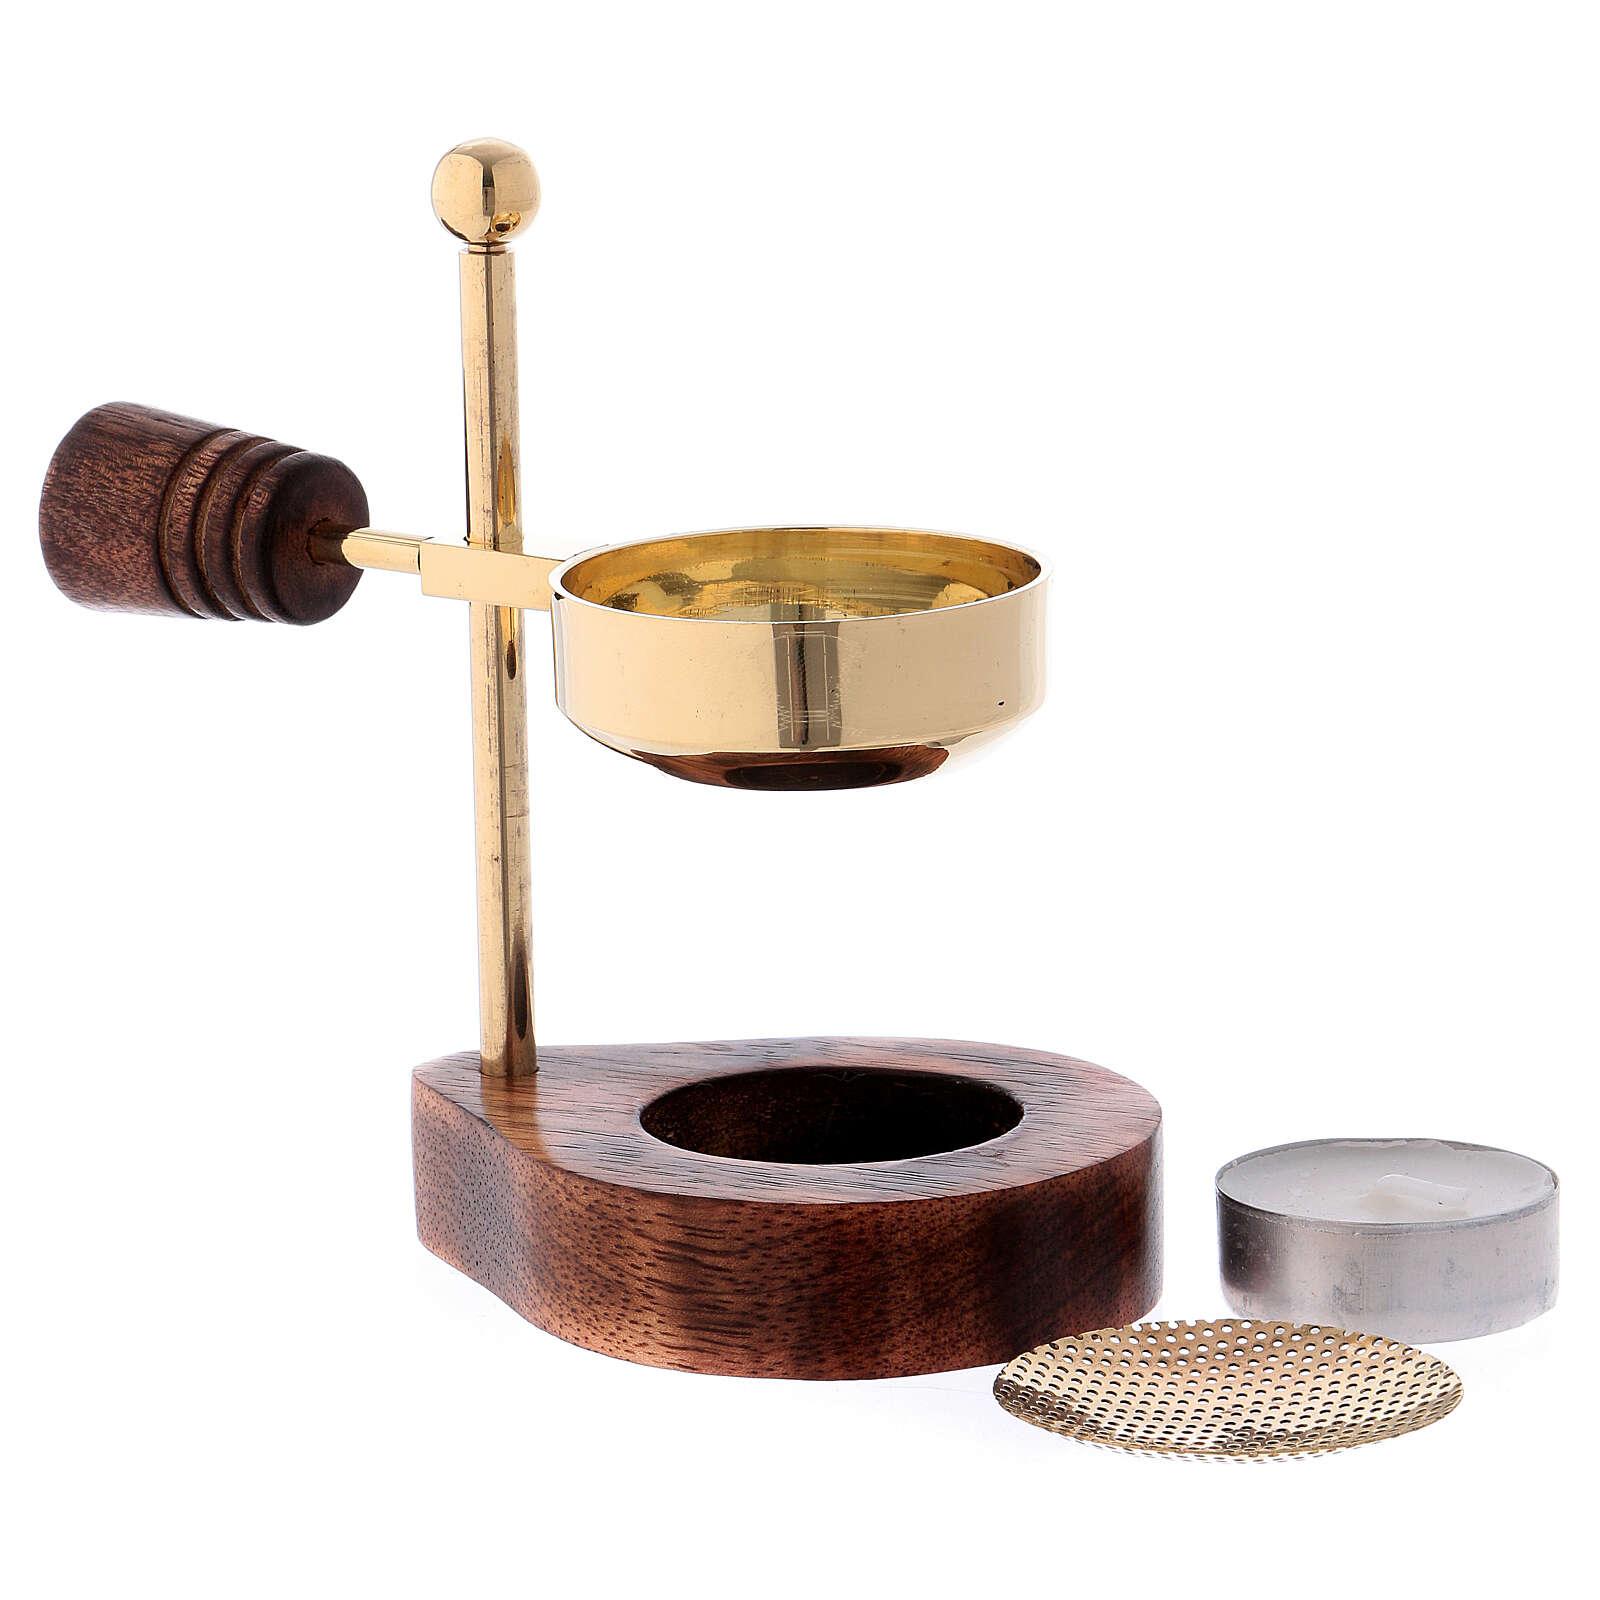 Incense burner with wood base and brass burner 4 3/4 in 3